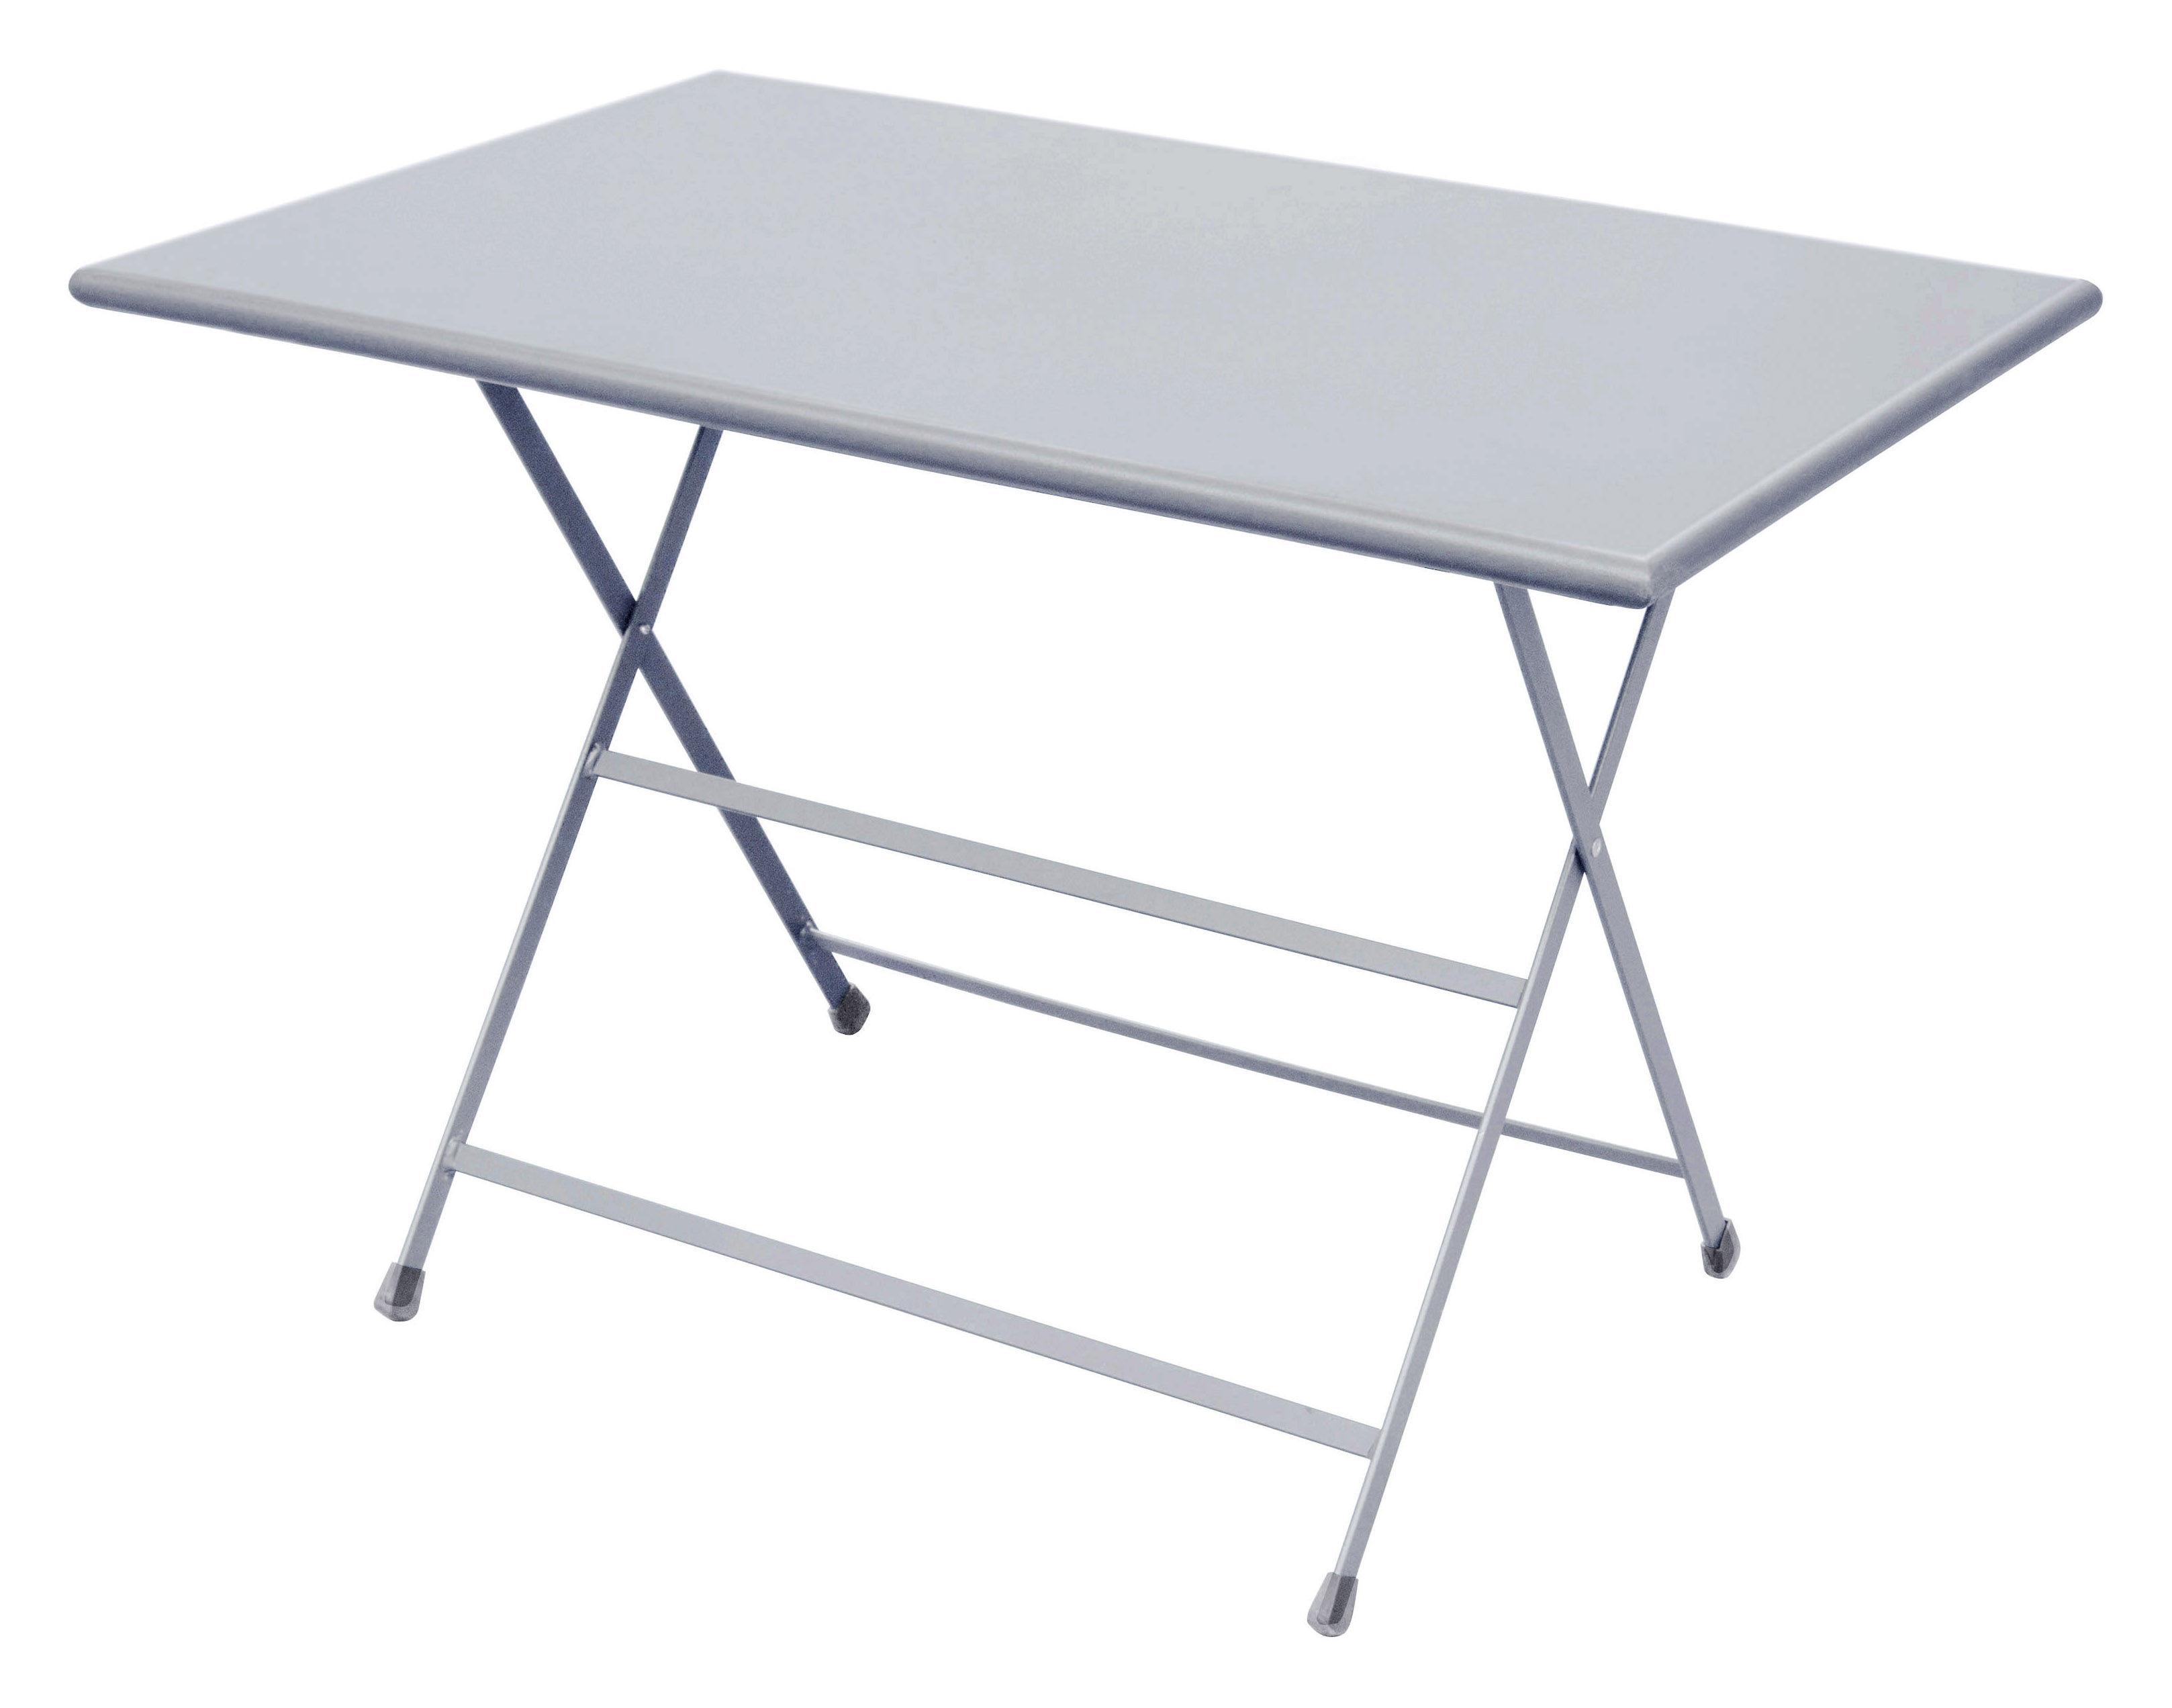 Table pliante arc en ciel 110 x 70 cm aluminium emu for Table cuisine 110 x 70